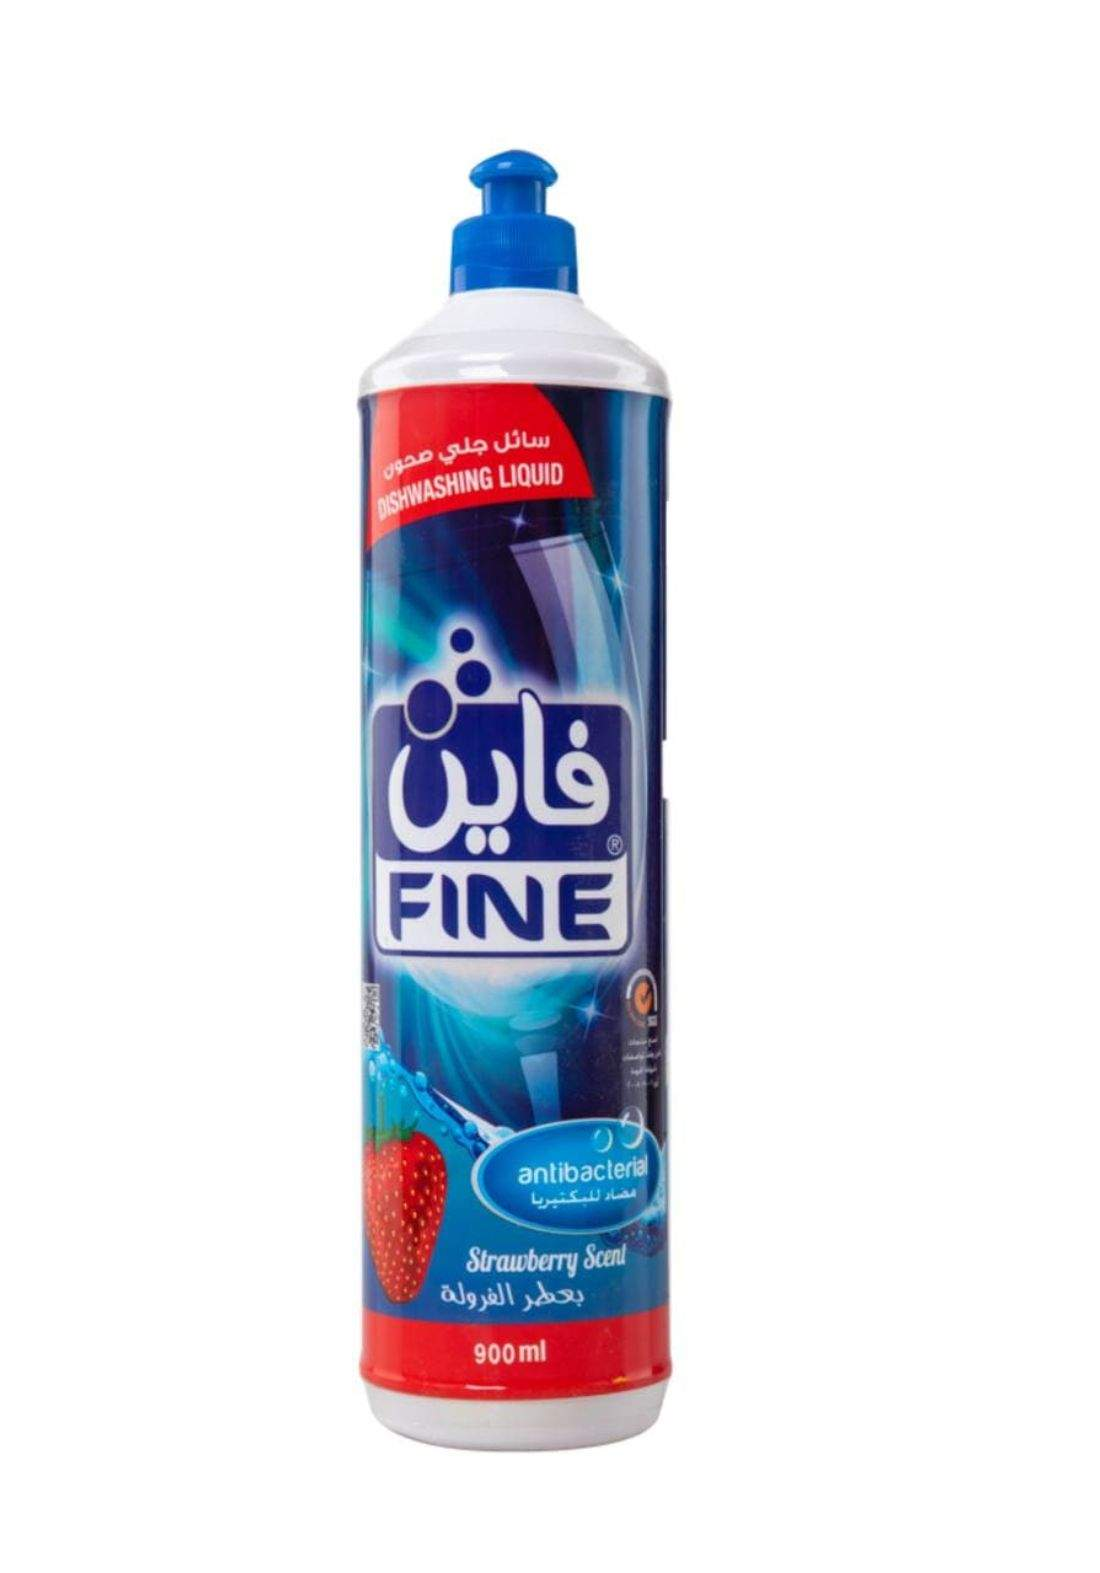 Fine dishwashing liquid 900ml فاين سائل غسيل الصحون